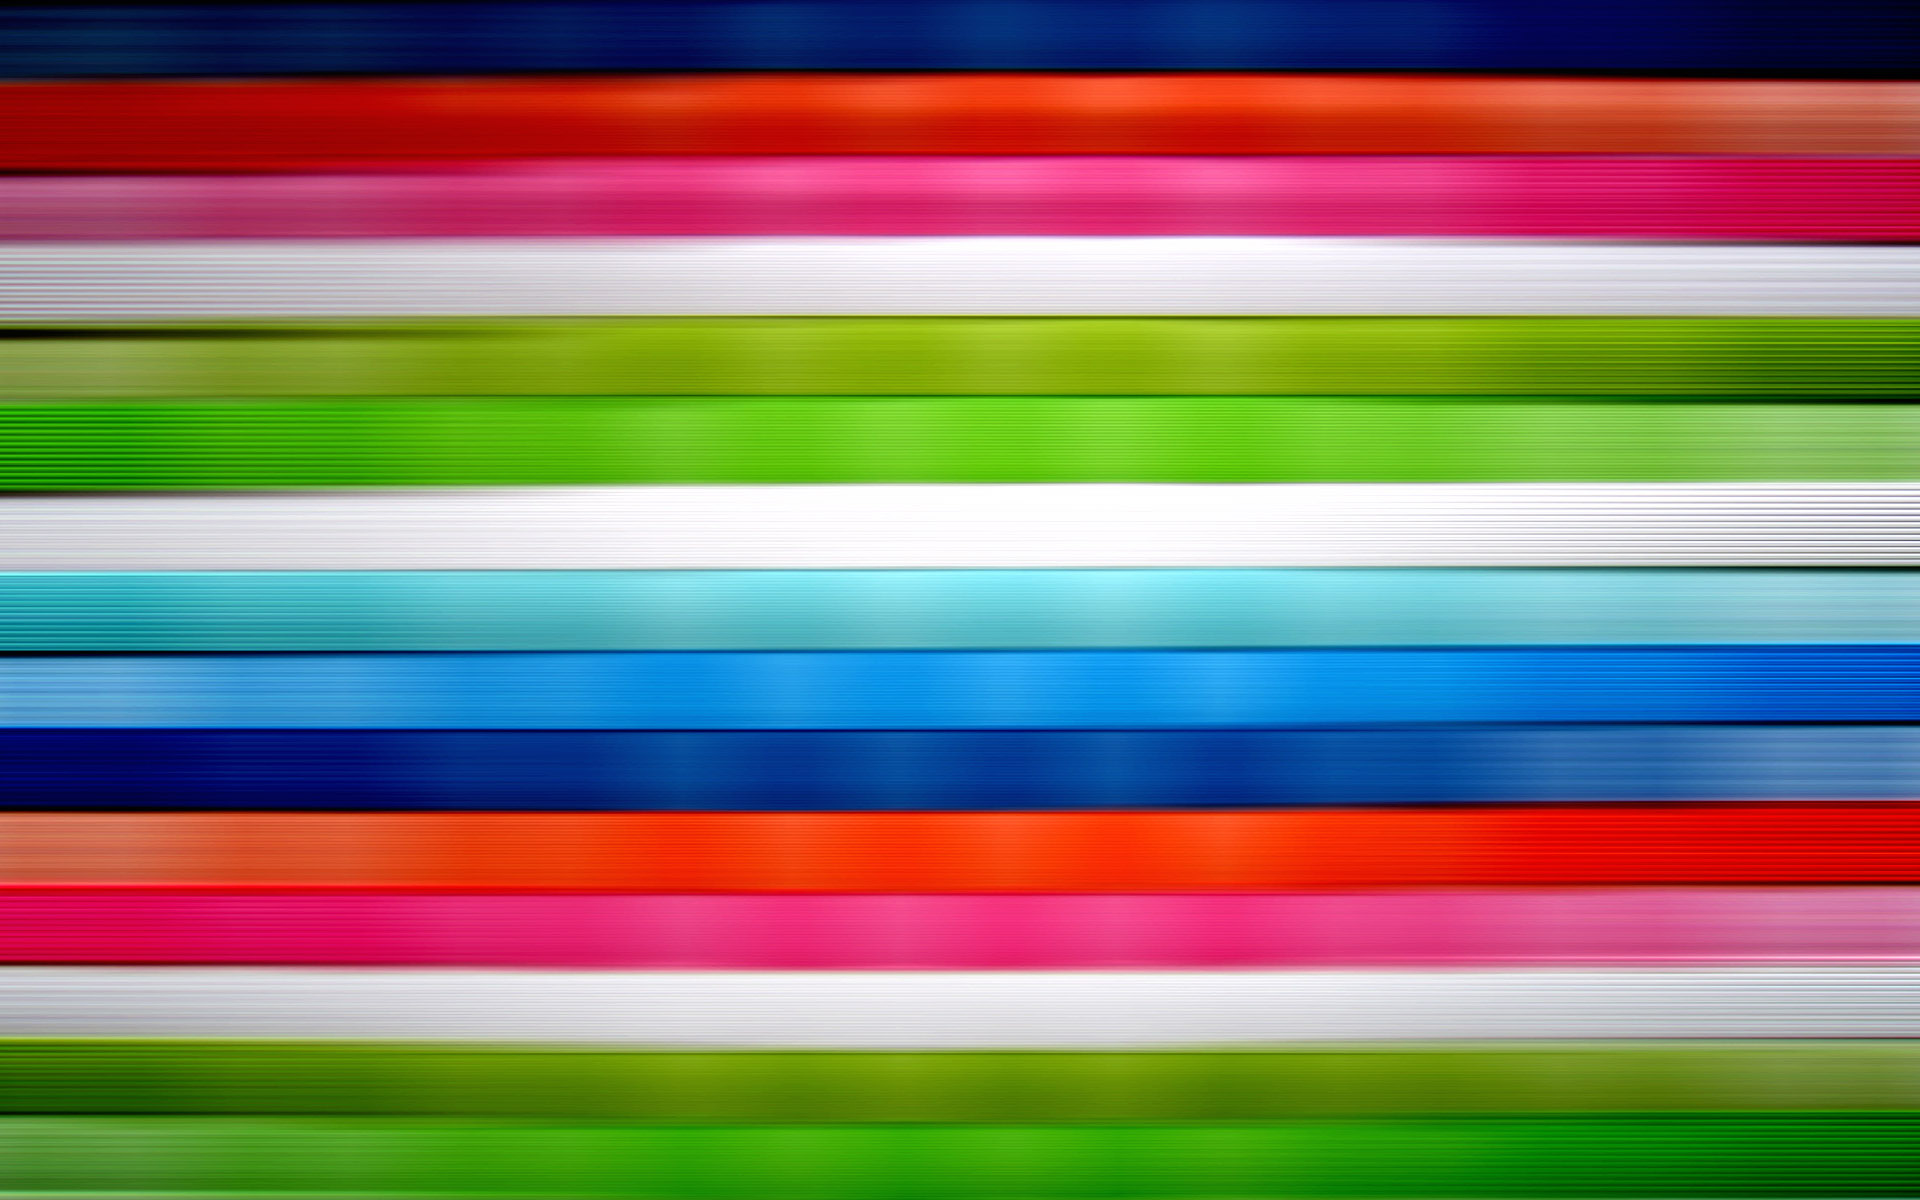 Hd Wallpaper Apk Free Download Vivid Colors Wallpapers Wallpapers Hd